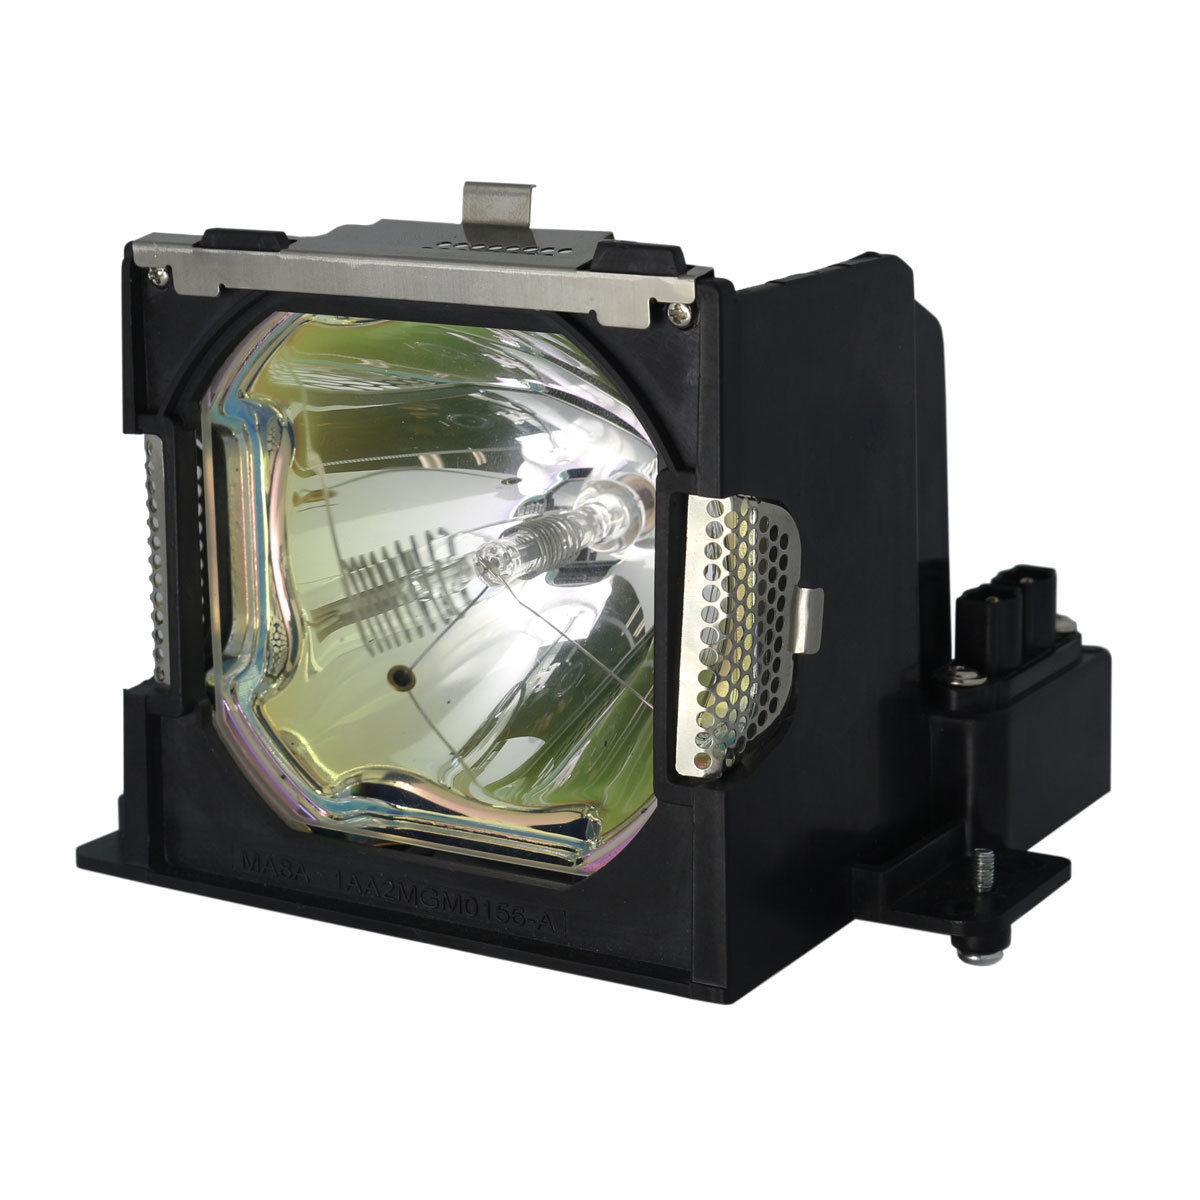 Projector Lamp Bulb POA-LMP38 LMP38 610-2935868 for SANYO PLC-XP40 PLC-XP45 PLV-70 PLV-75 PLC-VP45L PLV-70L PLV-75L With Housing poa lmp99 lmp99 for sanyo plc xp40 plc xp40l plc xp45 plc xp45l plv 70 plv 75 plv 75l lw25u projector bulb lamp without housing